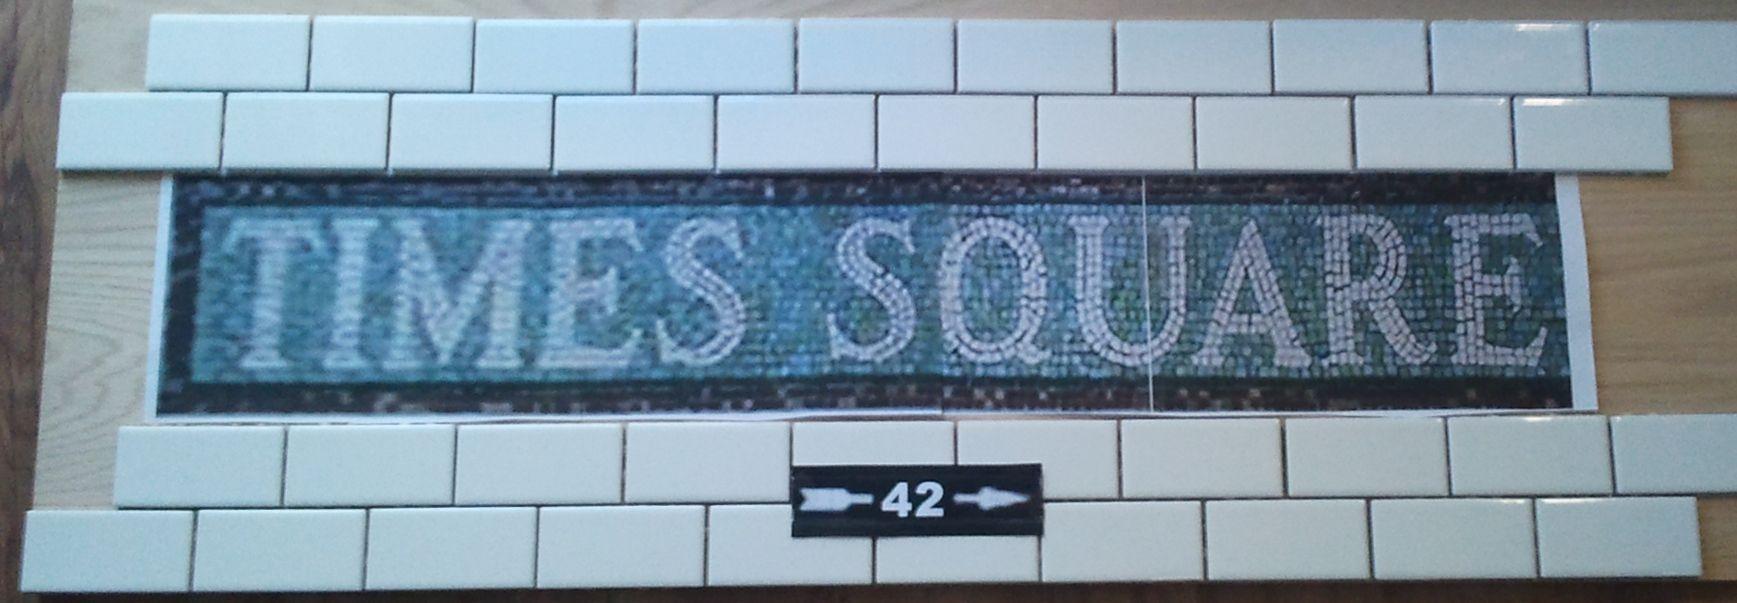 Ceramic letter tiles mosaic google search subway tiles ceramic letter tiles mosaic google search doublecrazyfo Image collections